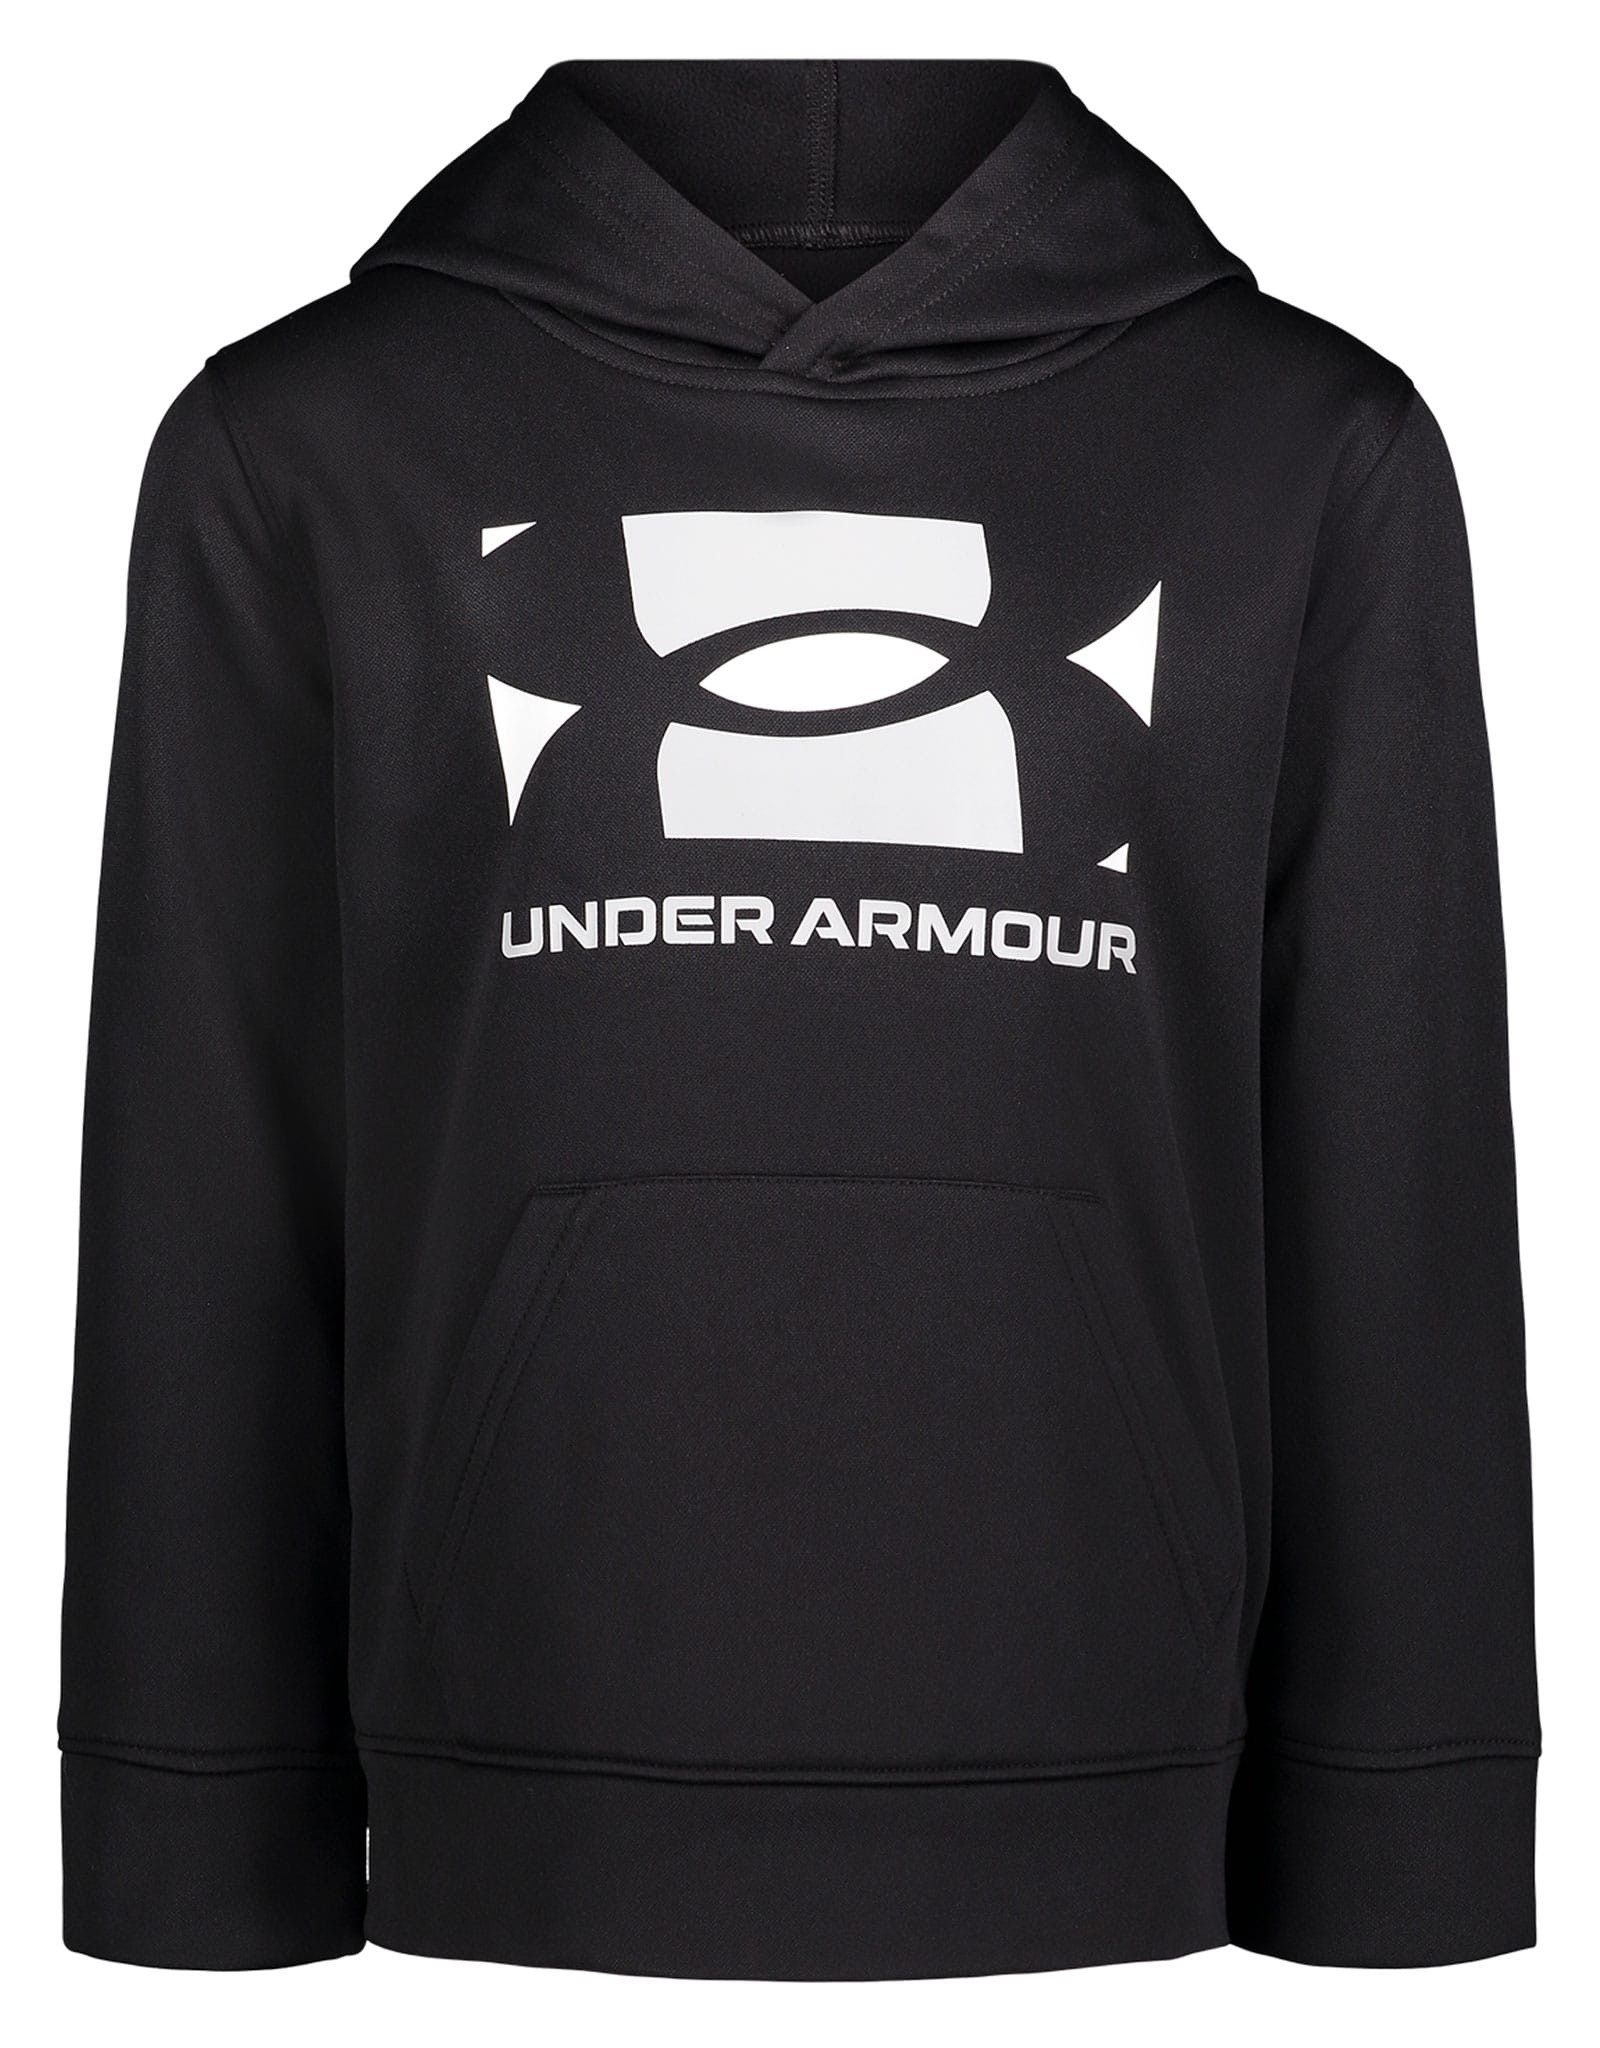 Under Armour FA21 B Box Logo Hoodie